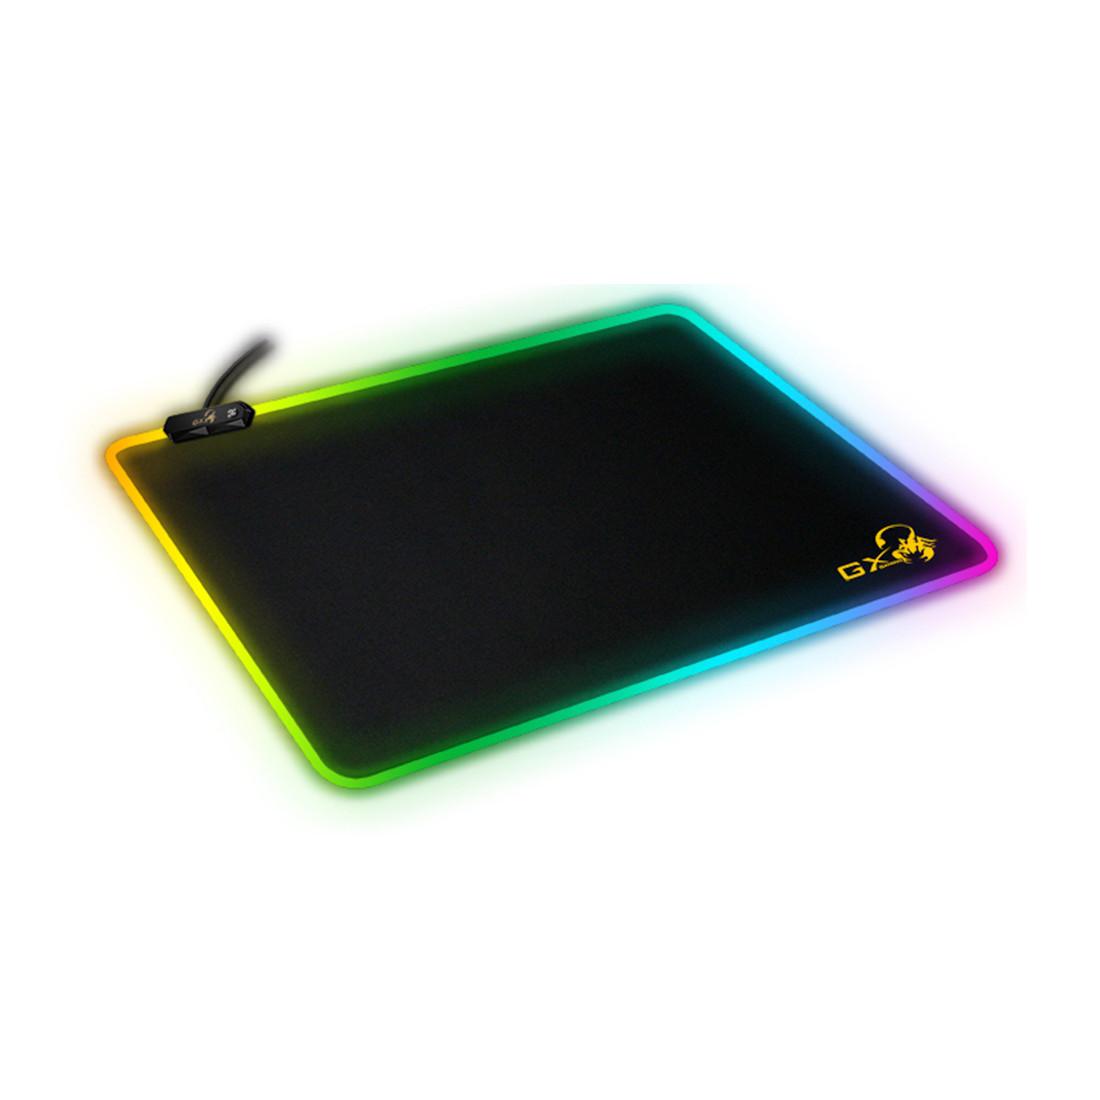 Коврик для компьютерной мыши Genius GX-Pad 300S RGB